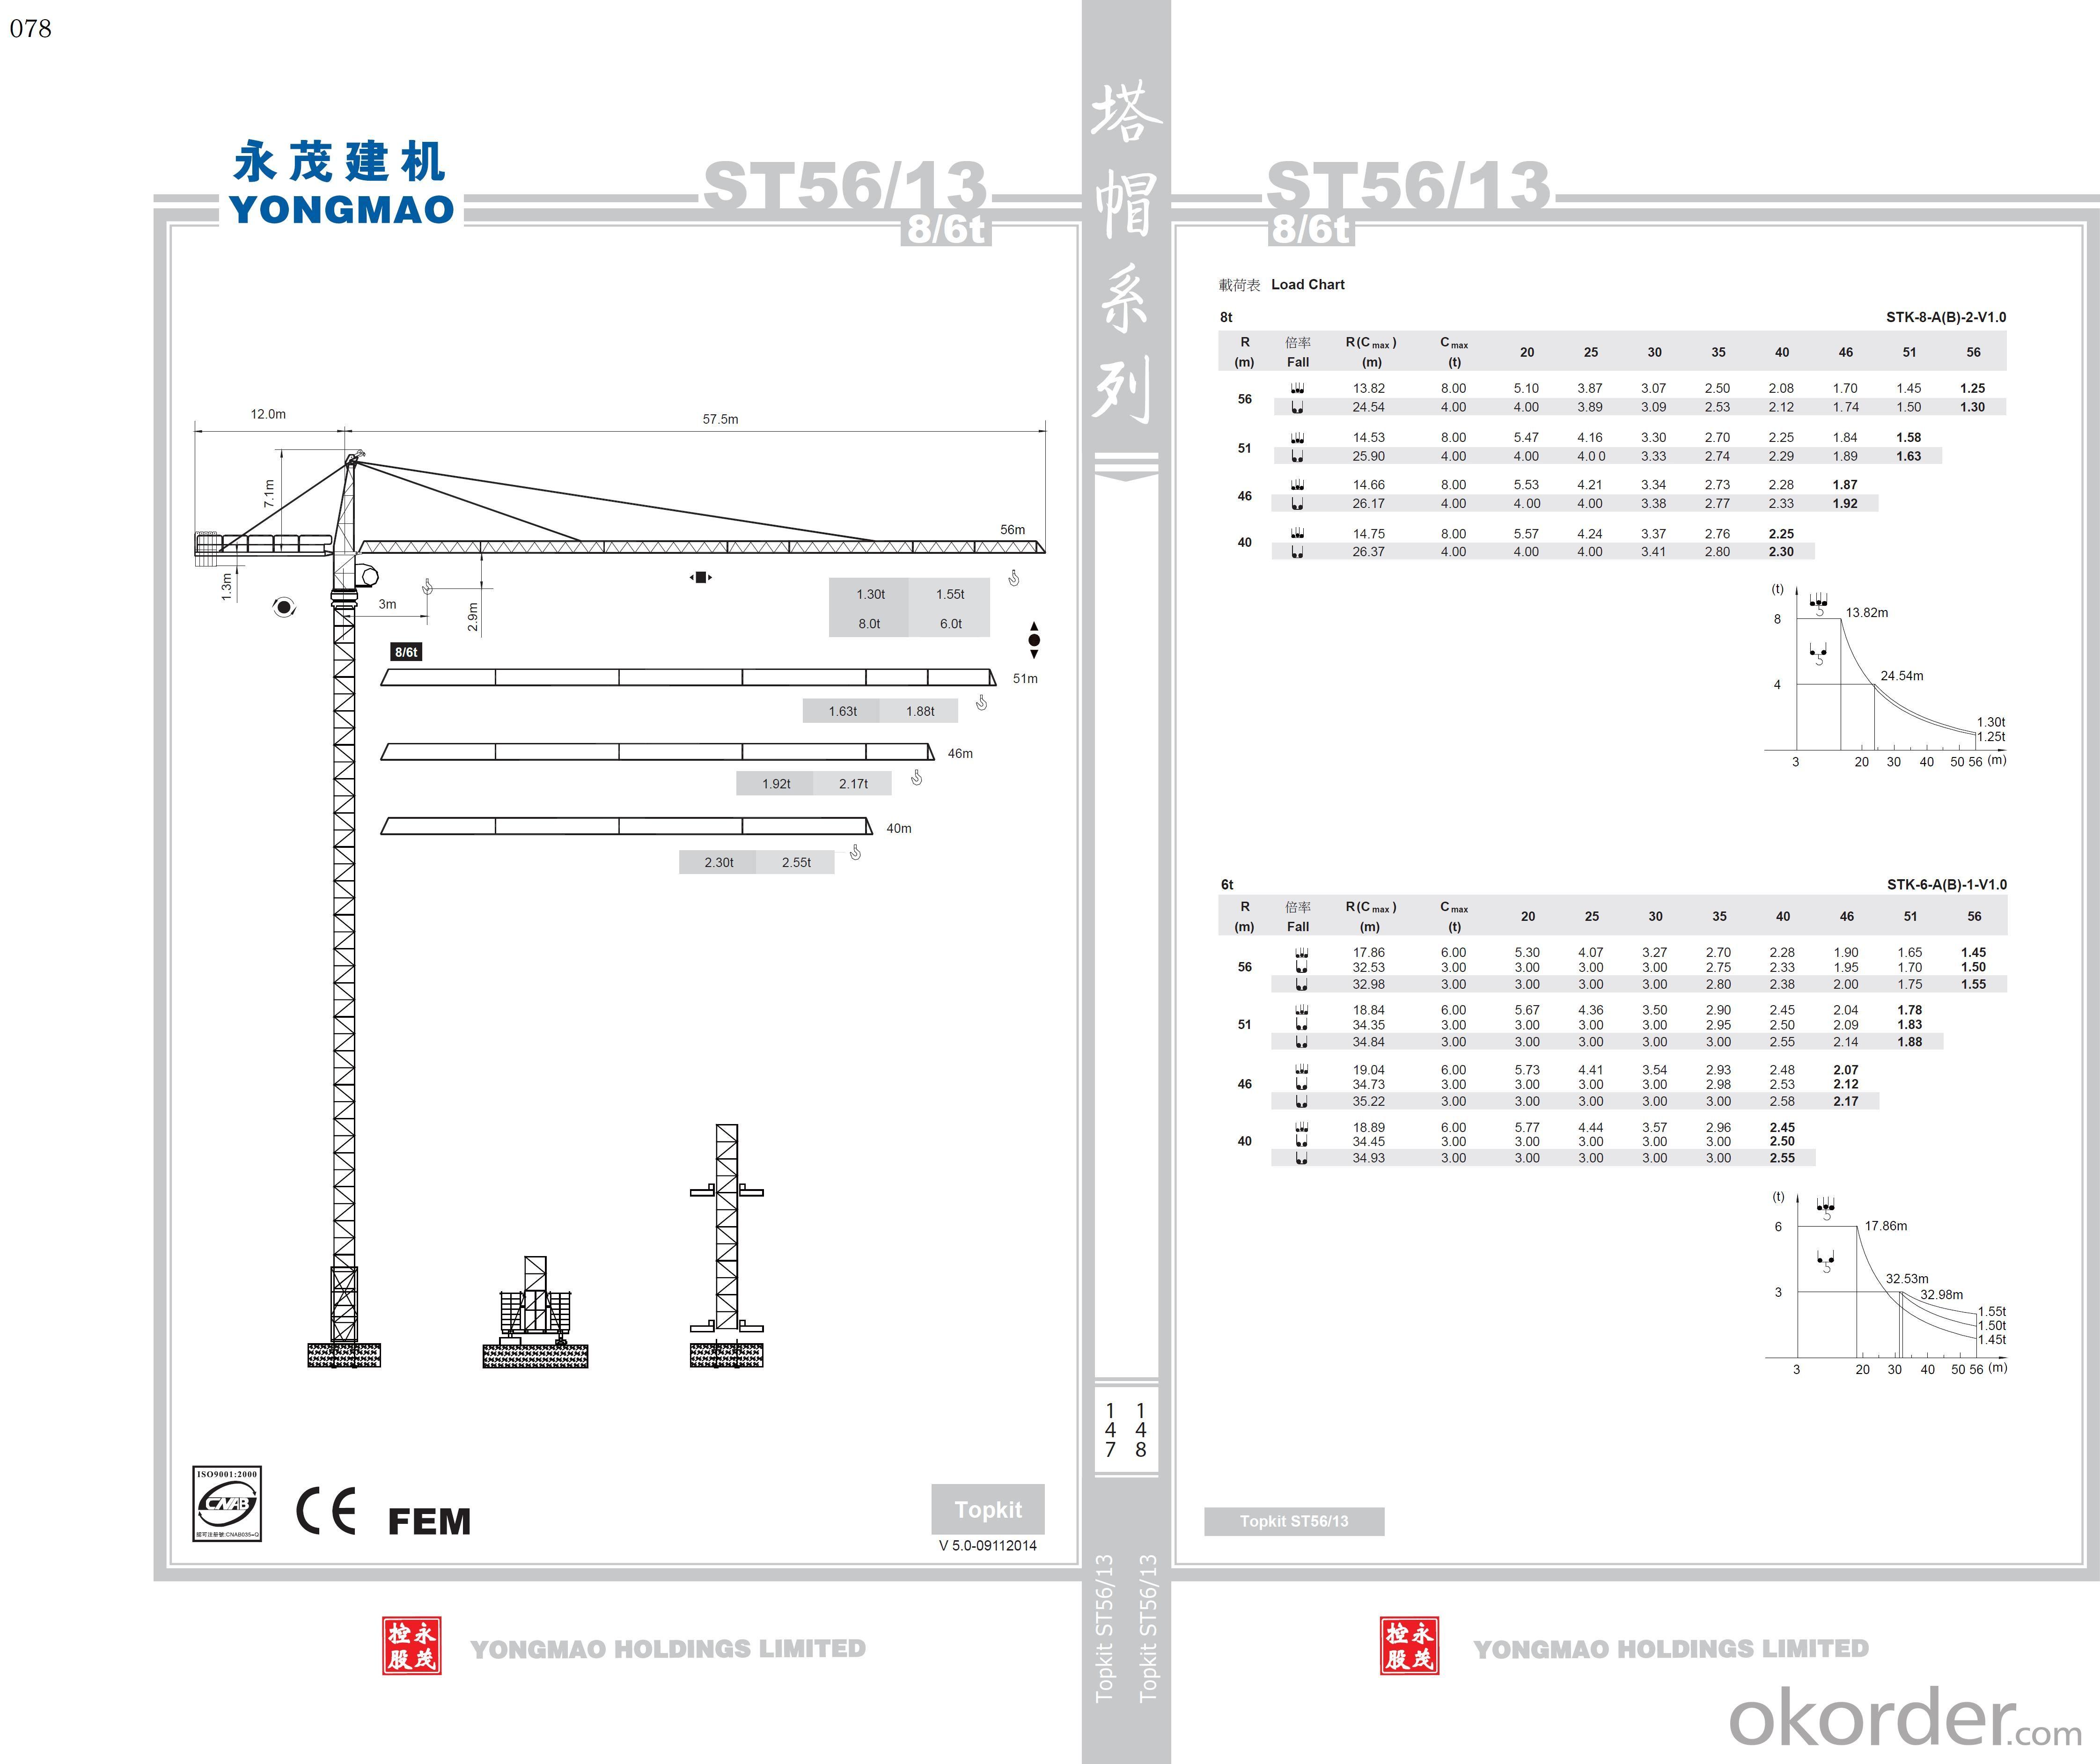 YONGMAO ST56/13 tower crane